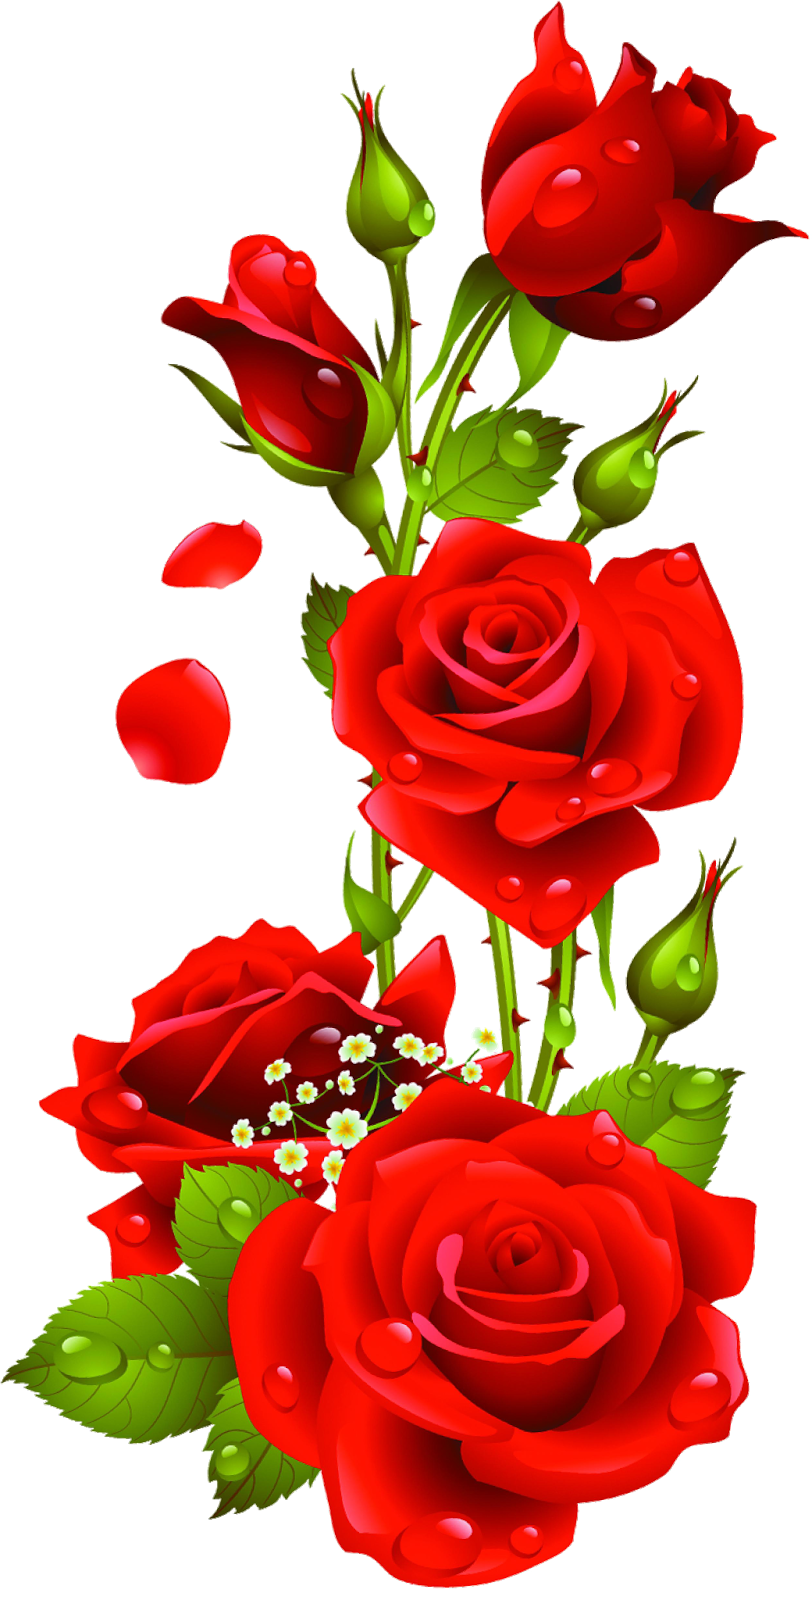 Roses 282 29 Png 812 1600 Beautiful Rose Flowers Flower Phone Wallpaper Rose Flower Wallpaper